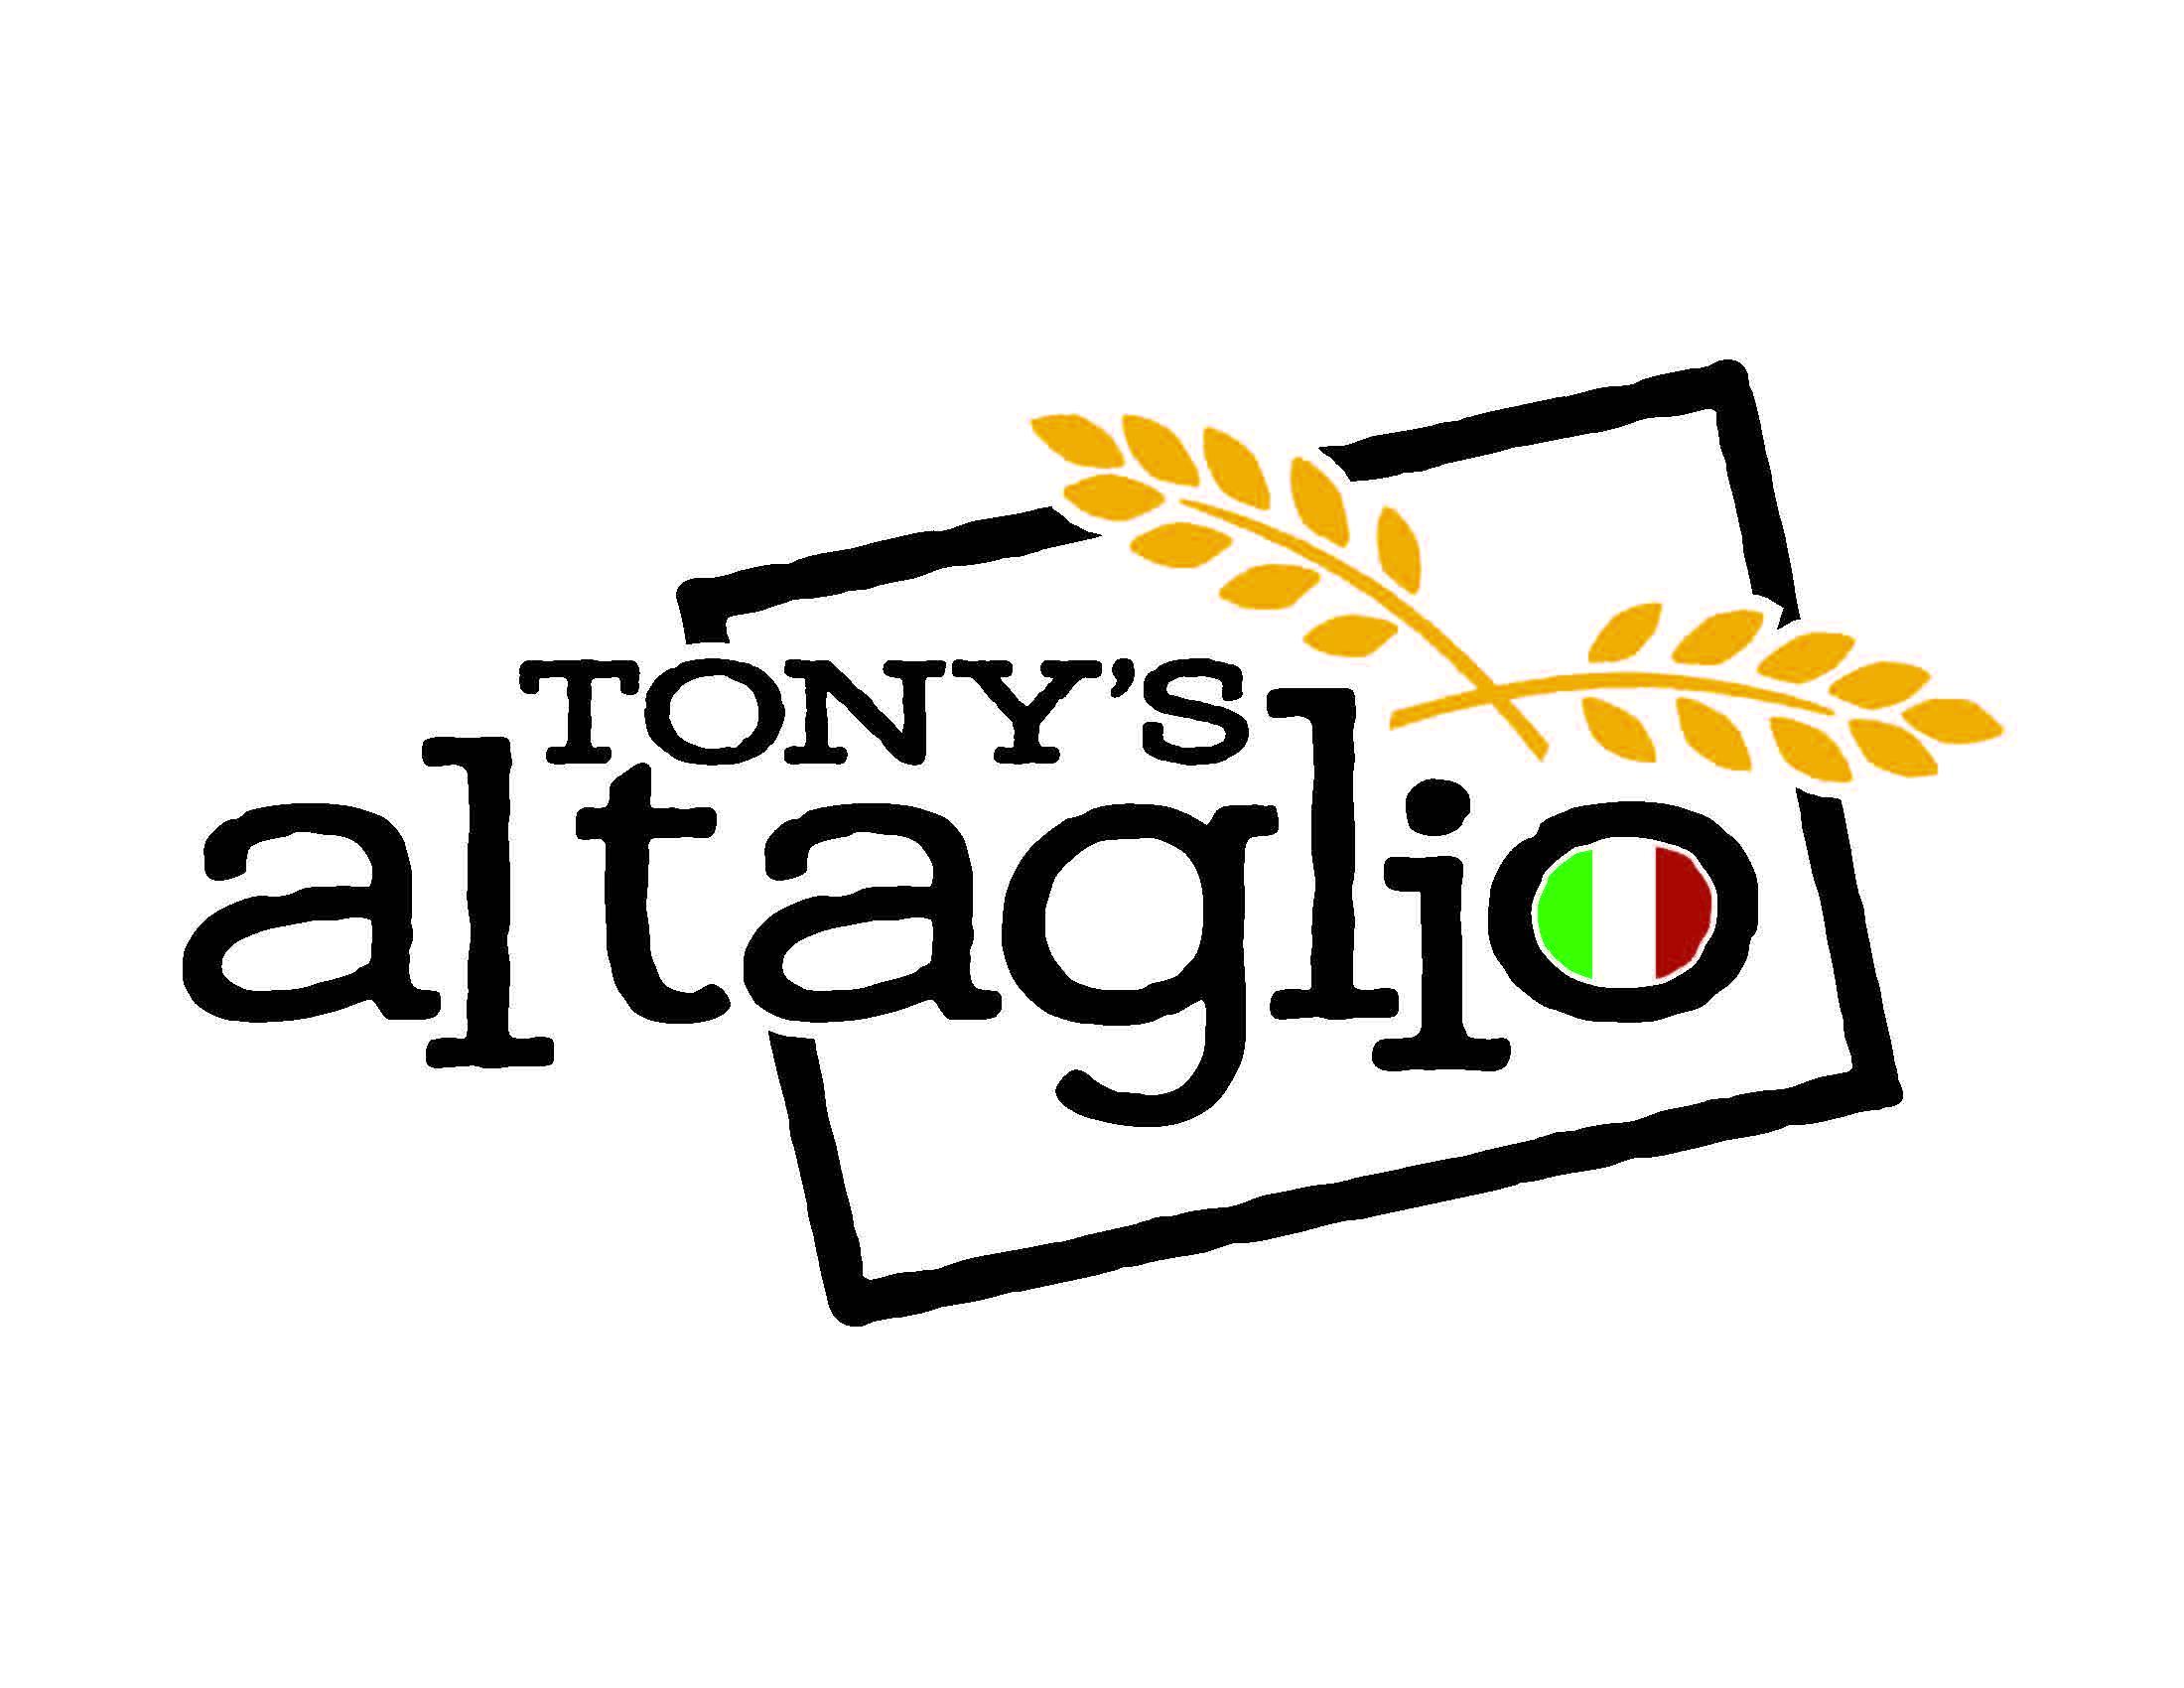 Tony's al taglio Restaurant